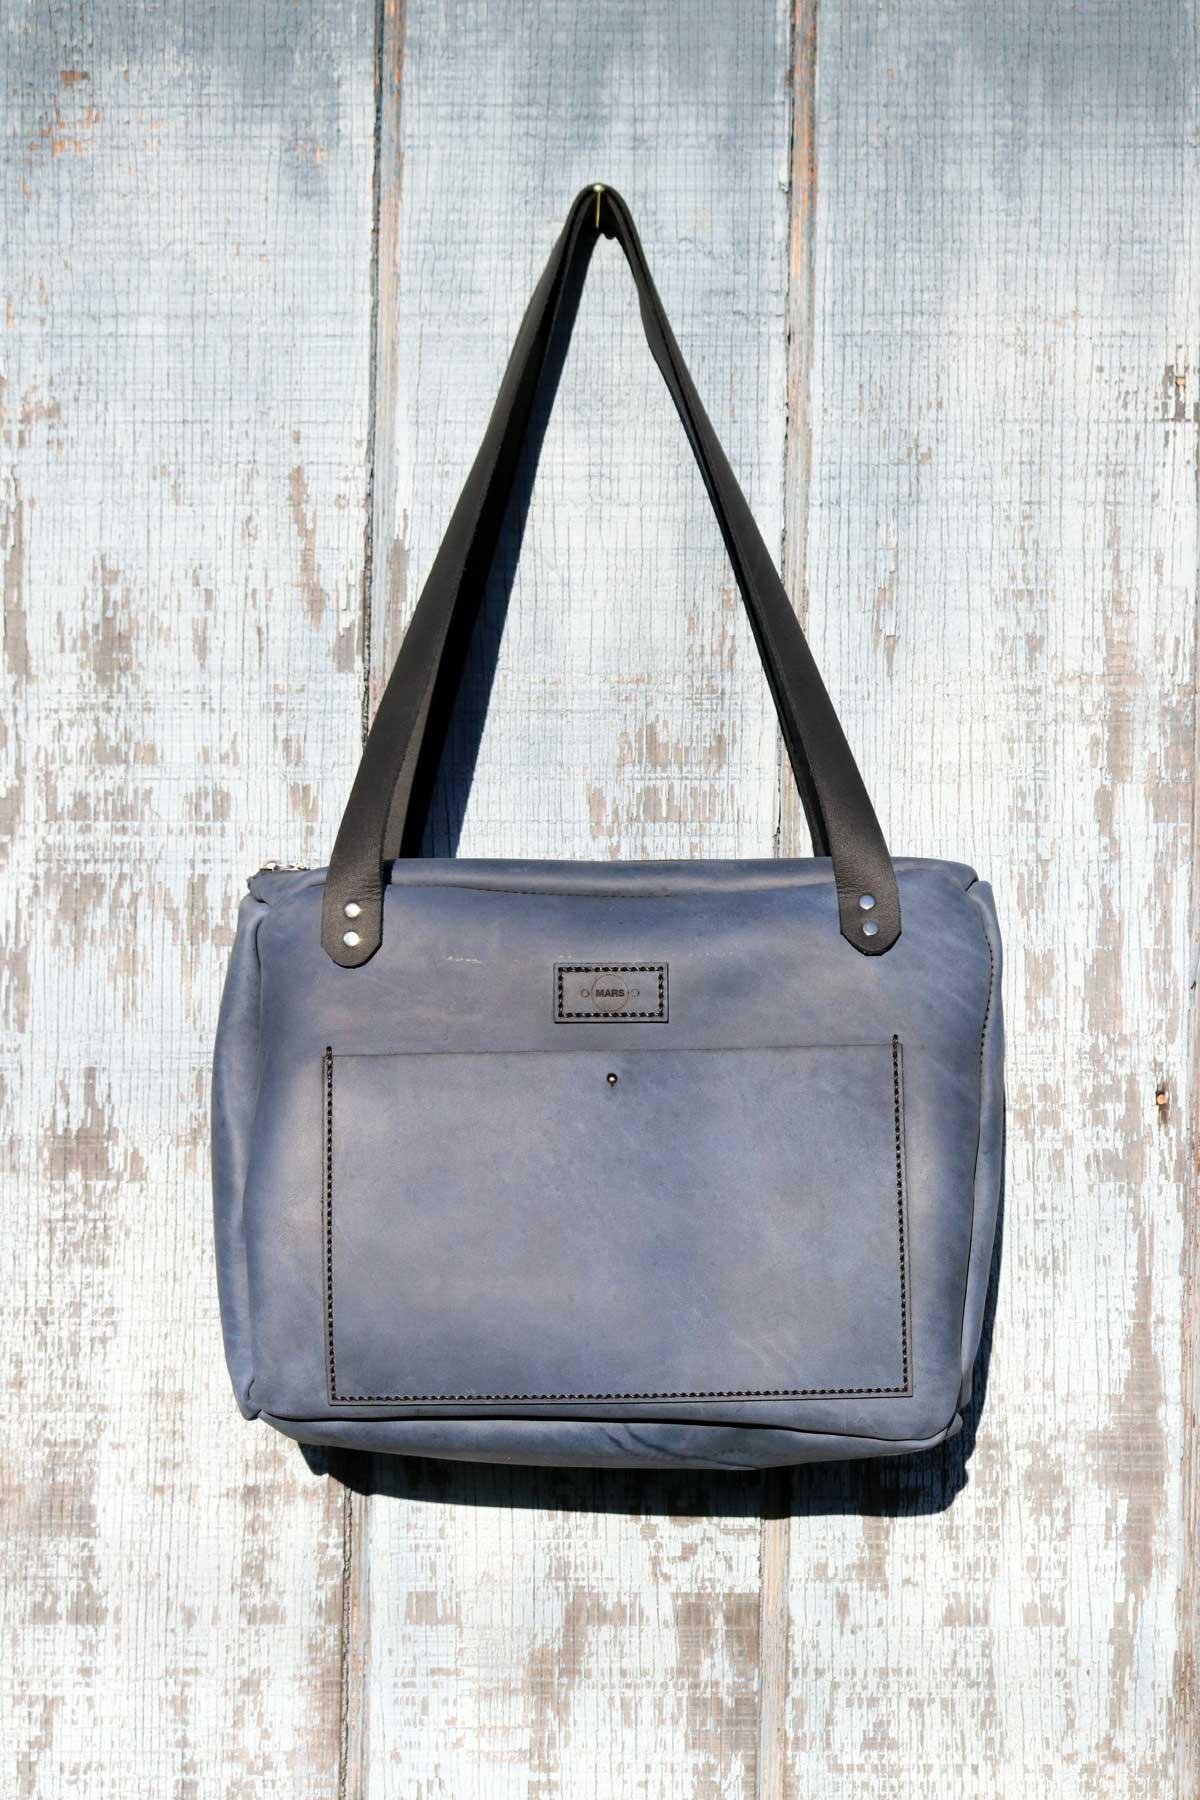 10_Mars-Everyday-Bag-With-Zipper-04.jpg